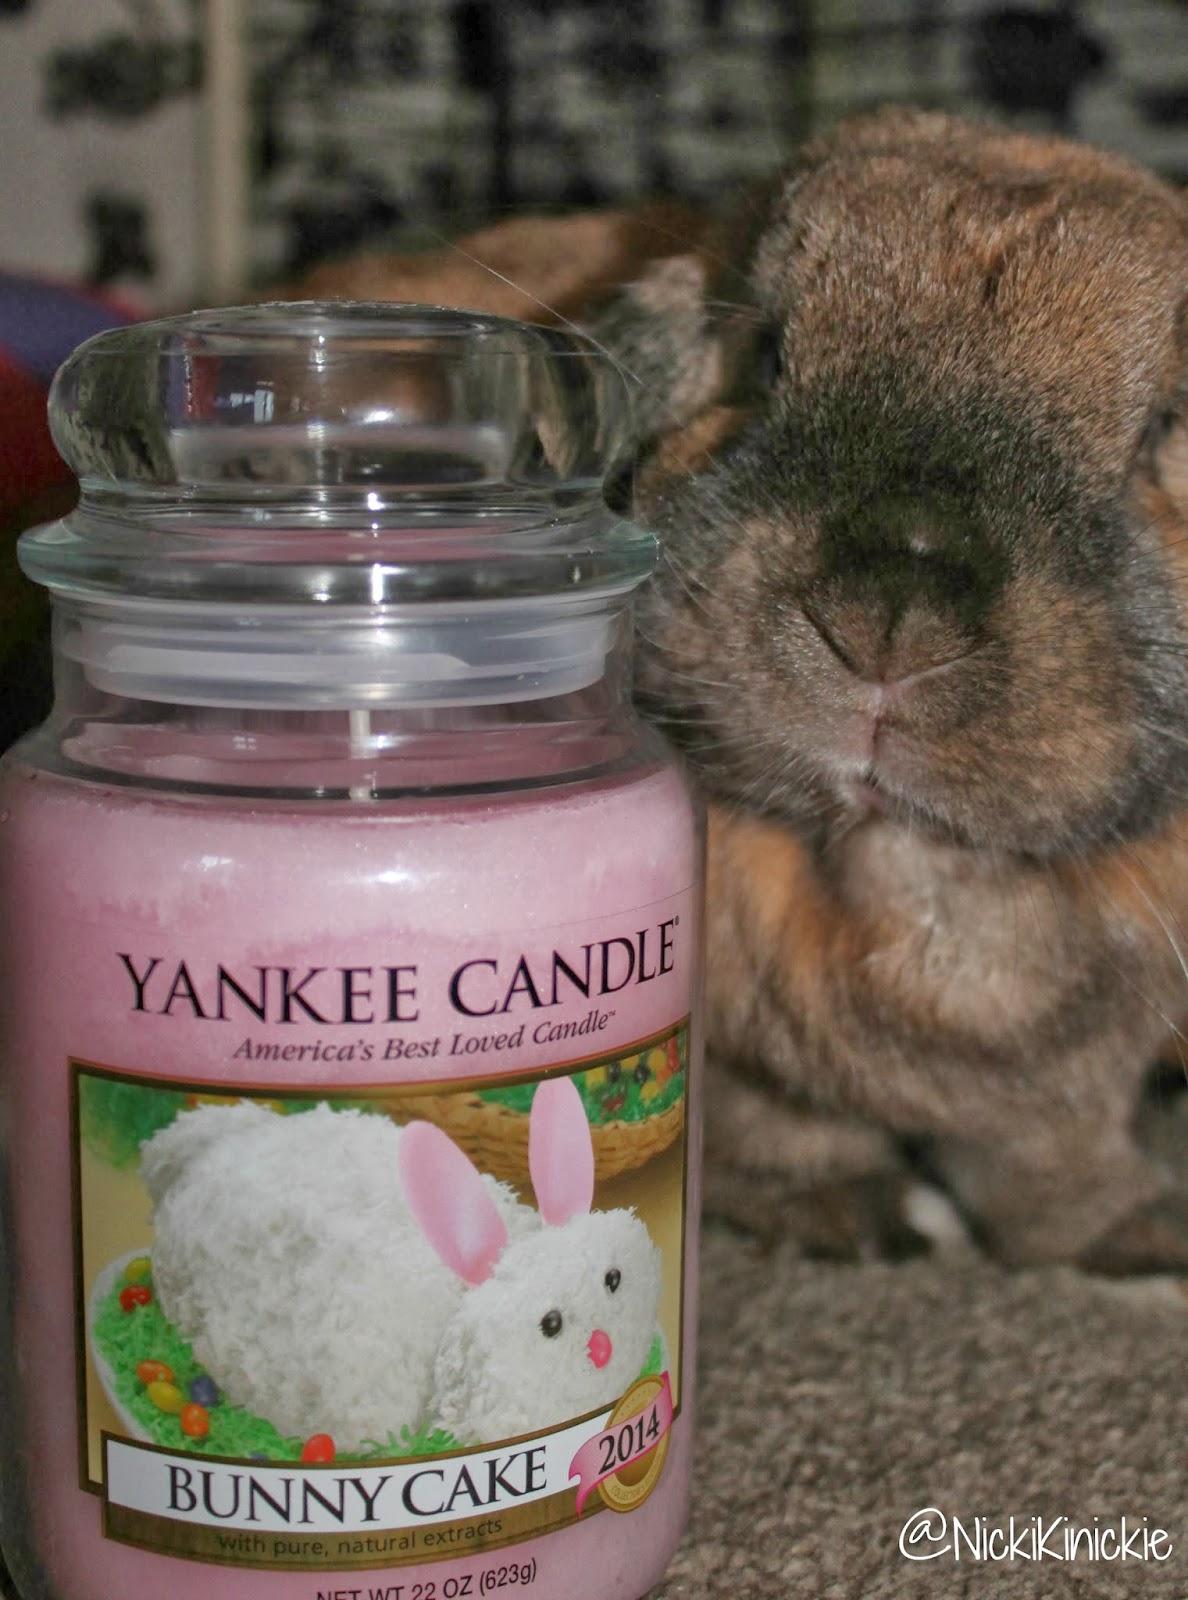 Yankee Candle Bunny Cake